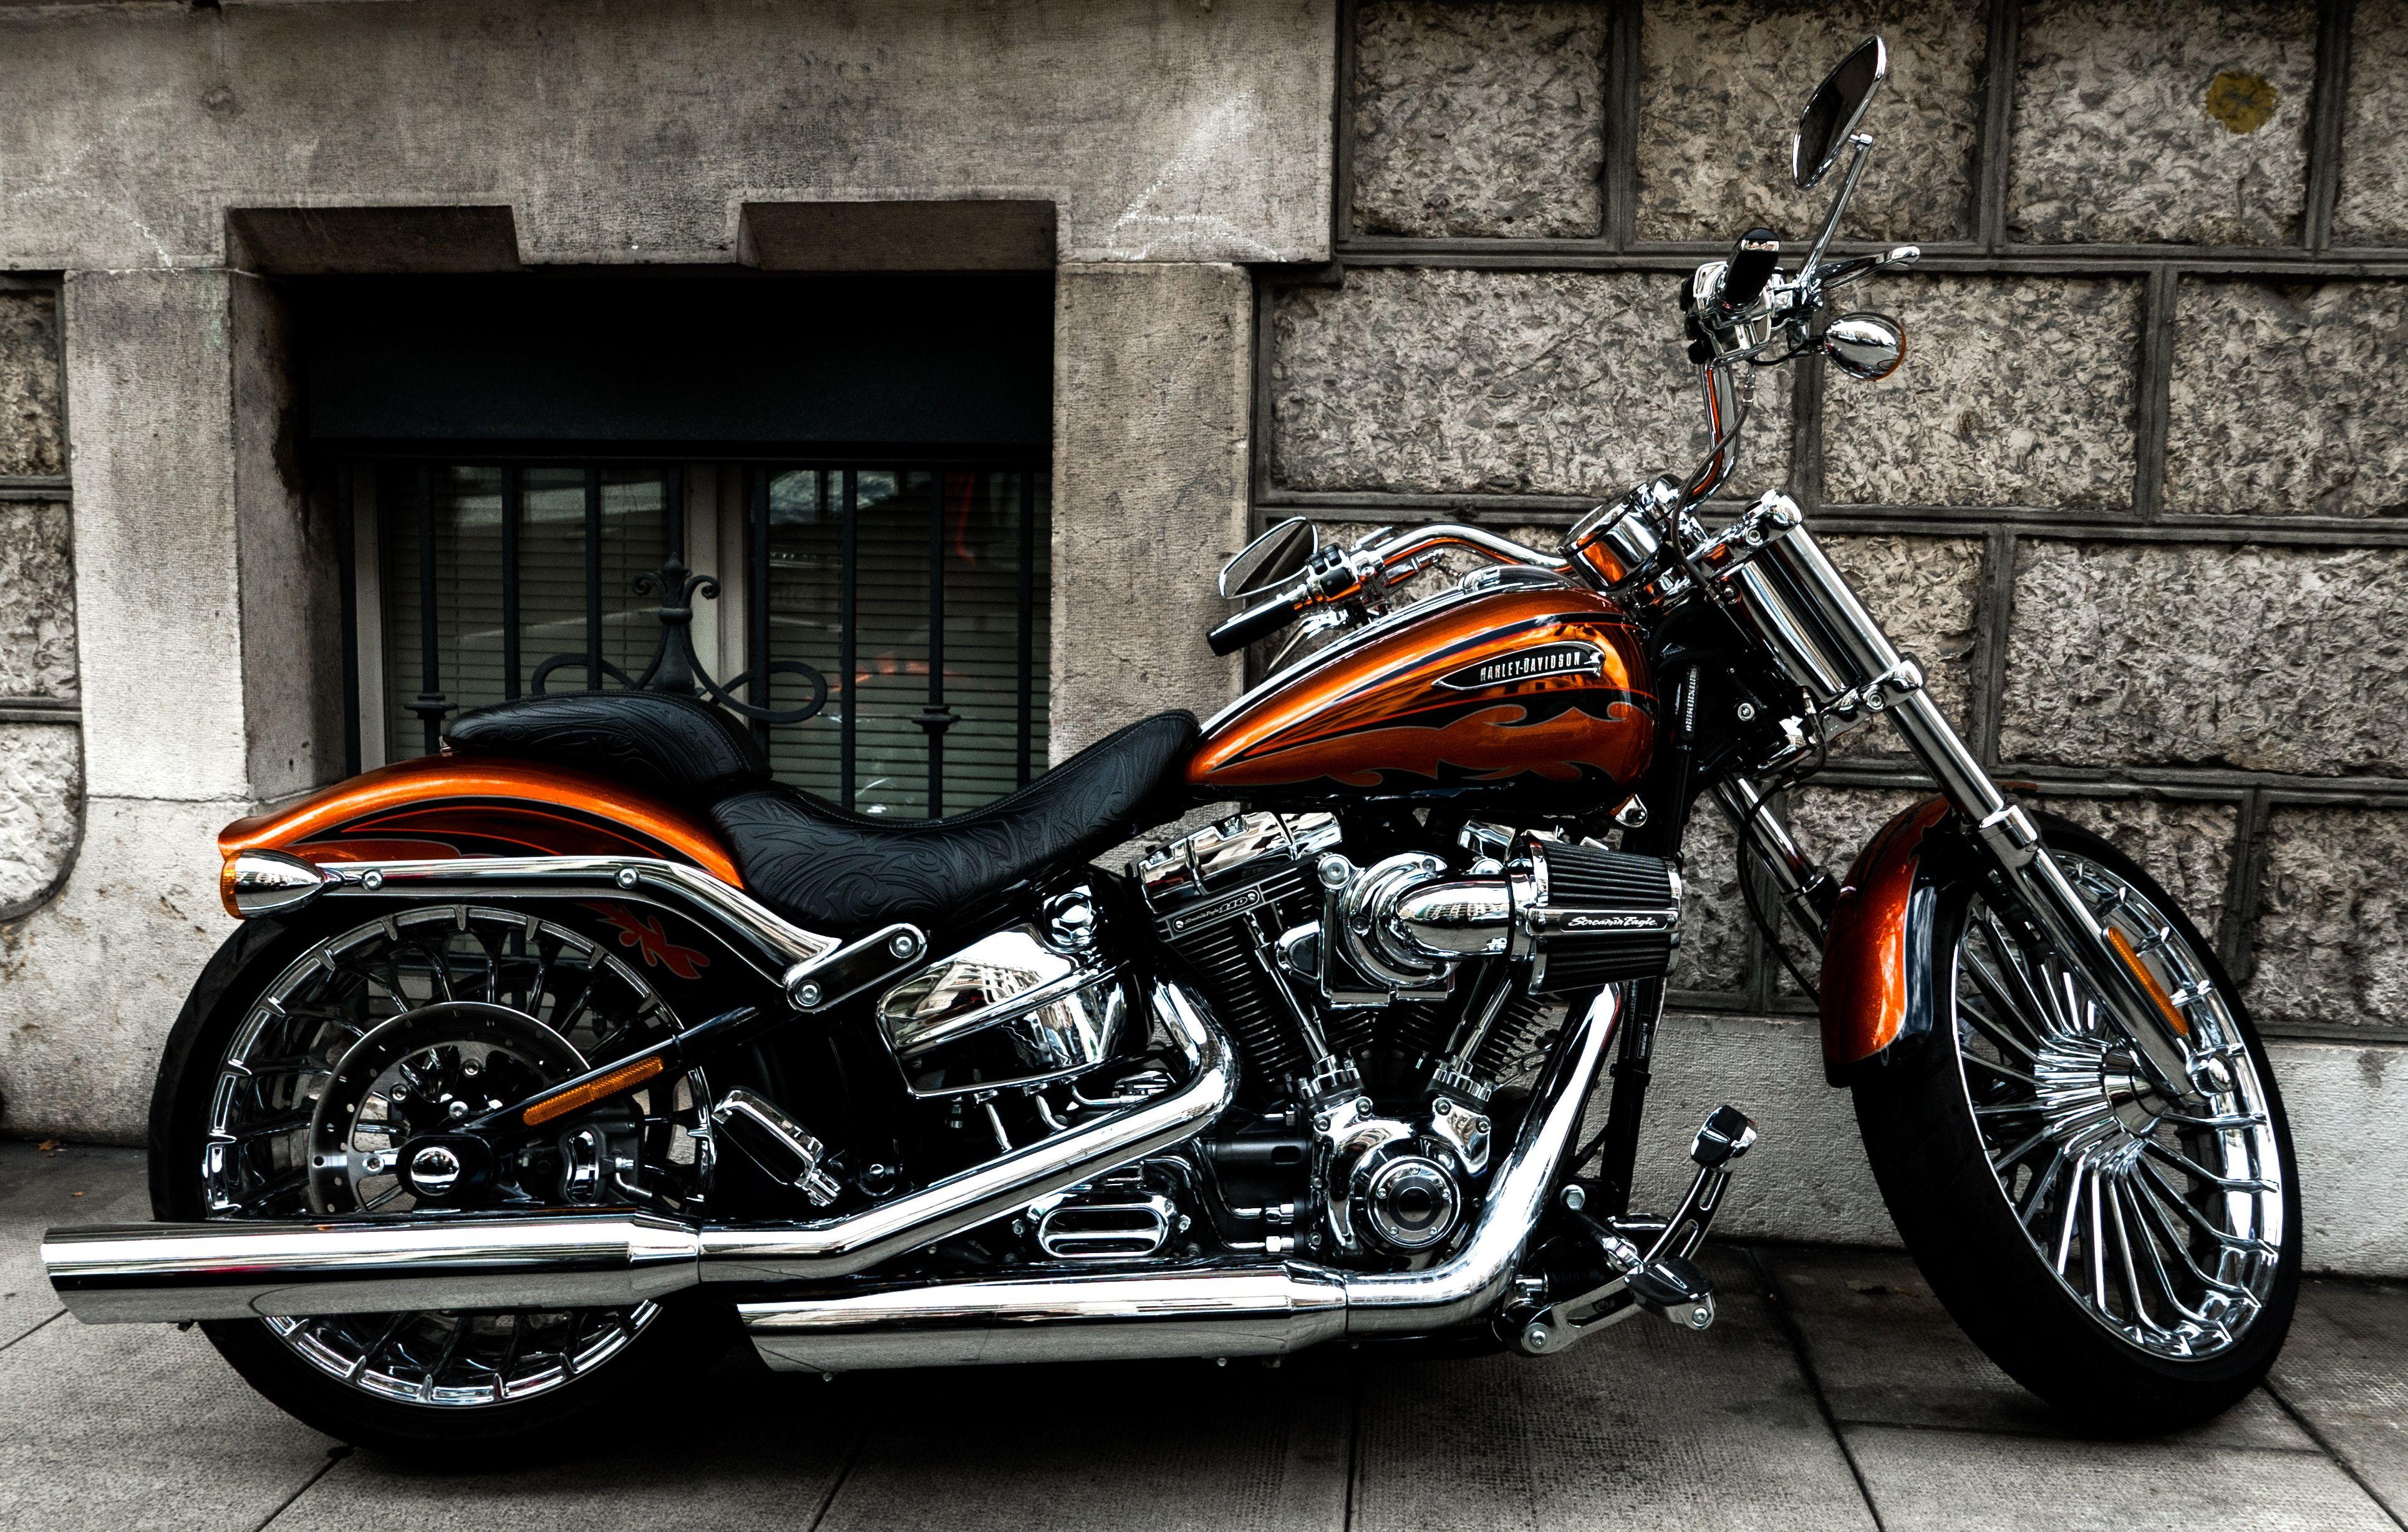 Motorbike Insurance Motorcycle wallpaper, Motorcycle